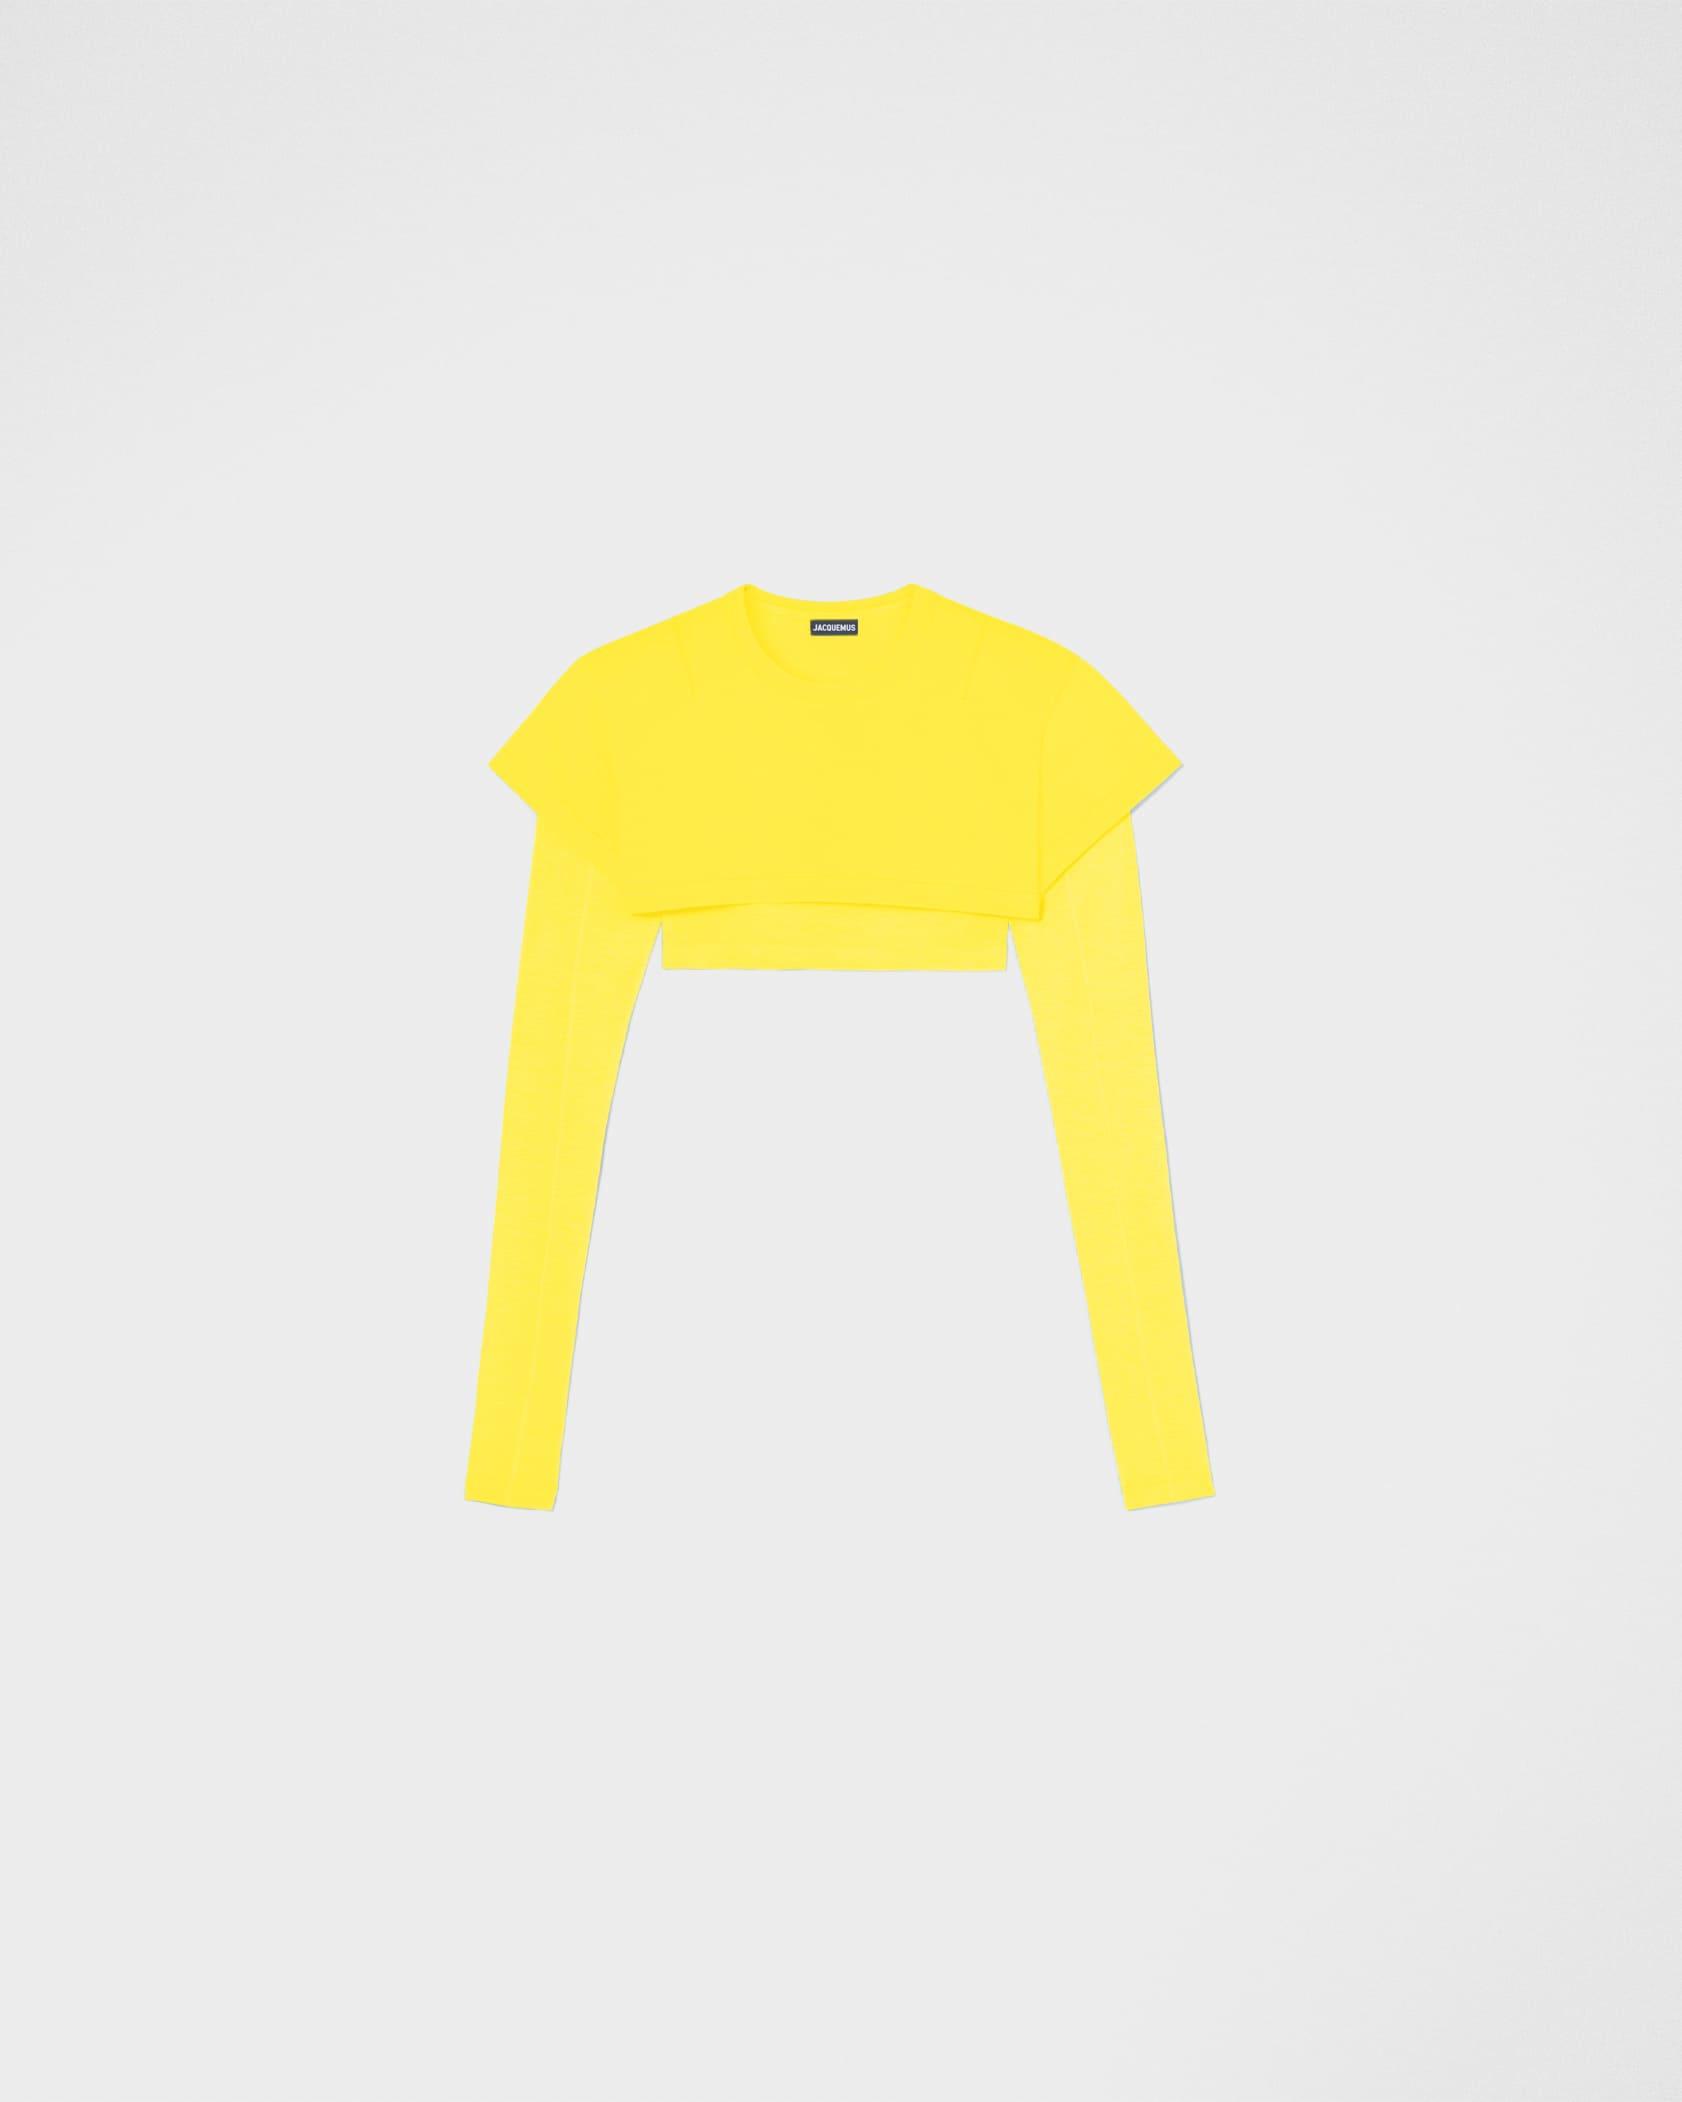 213js10-213_245230_le_double_tshirt_yellow_6_1